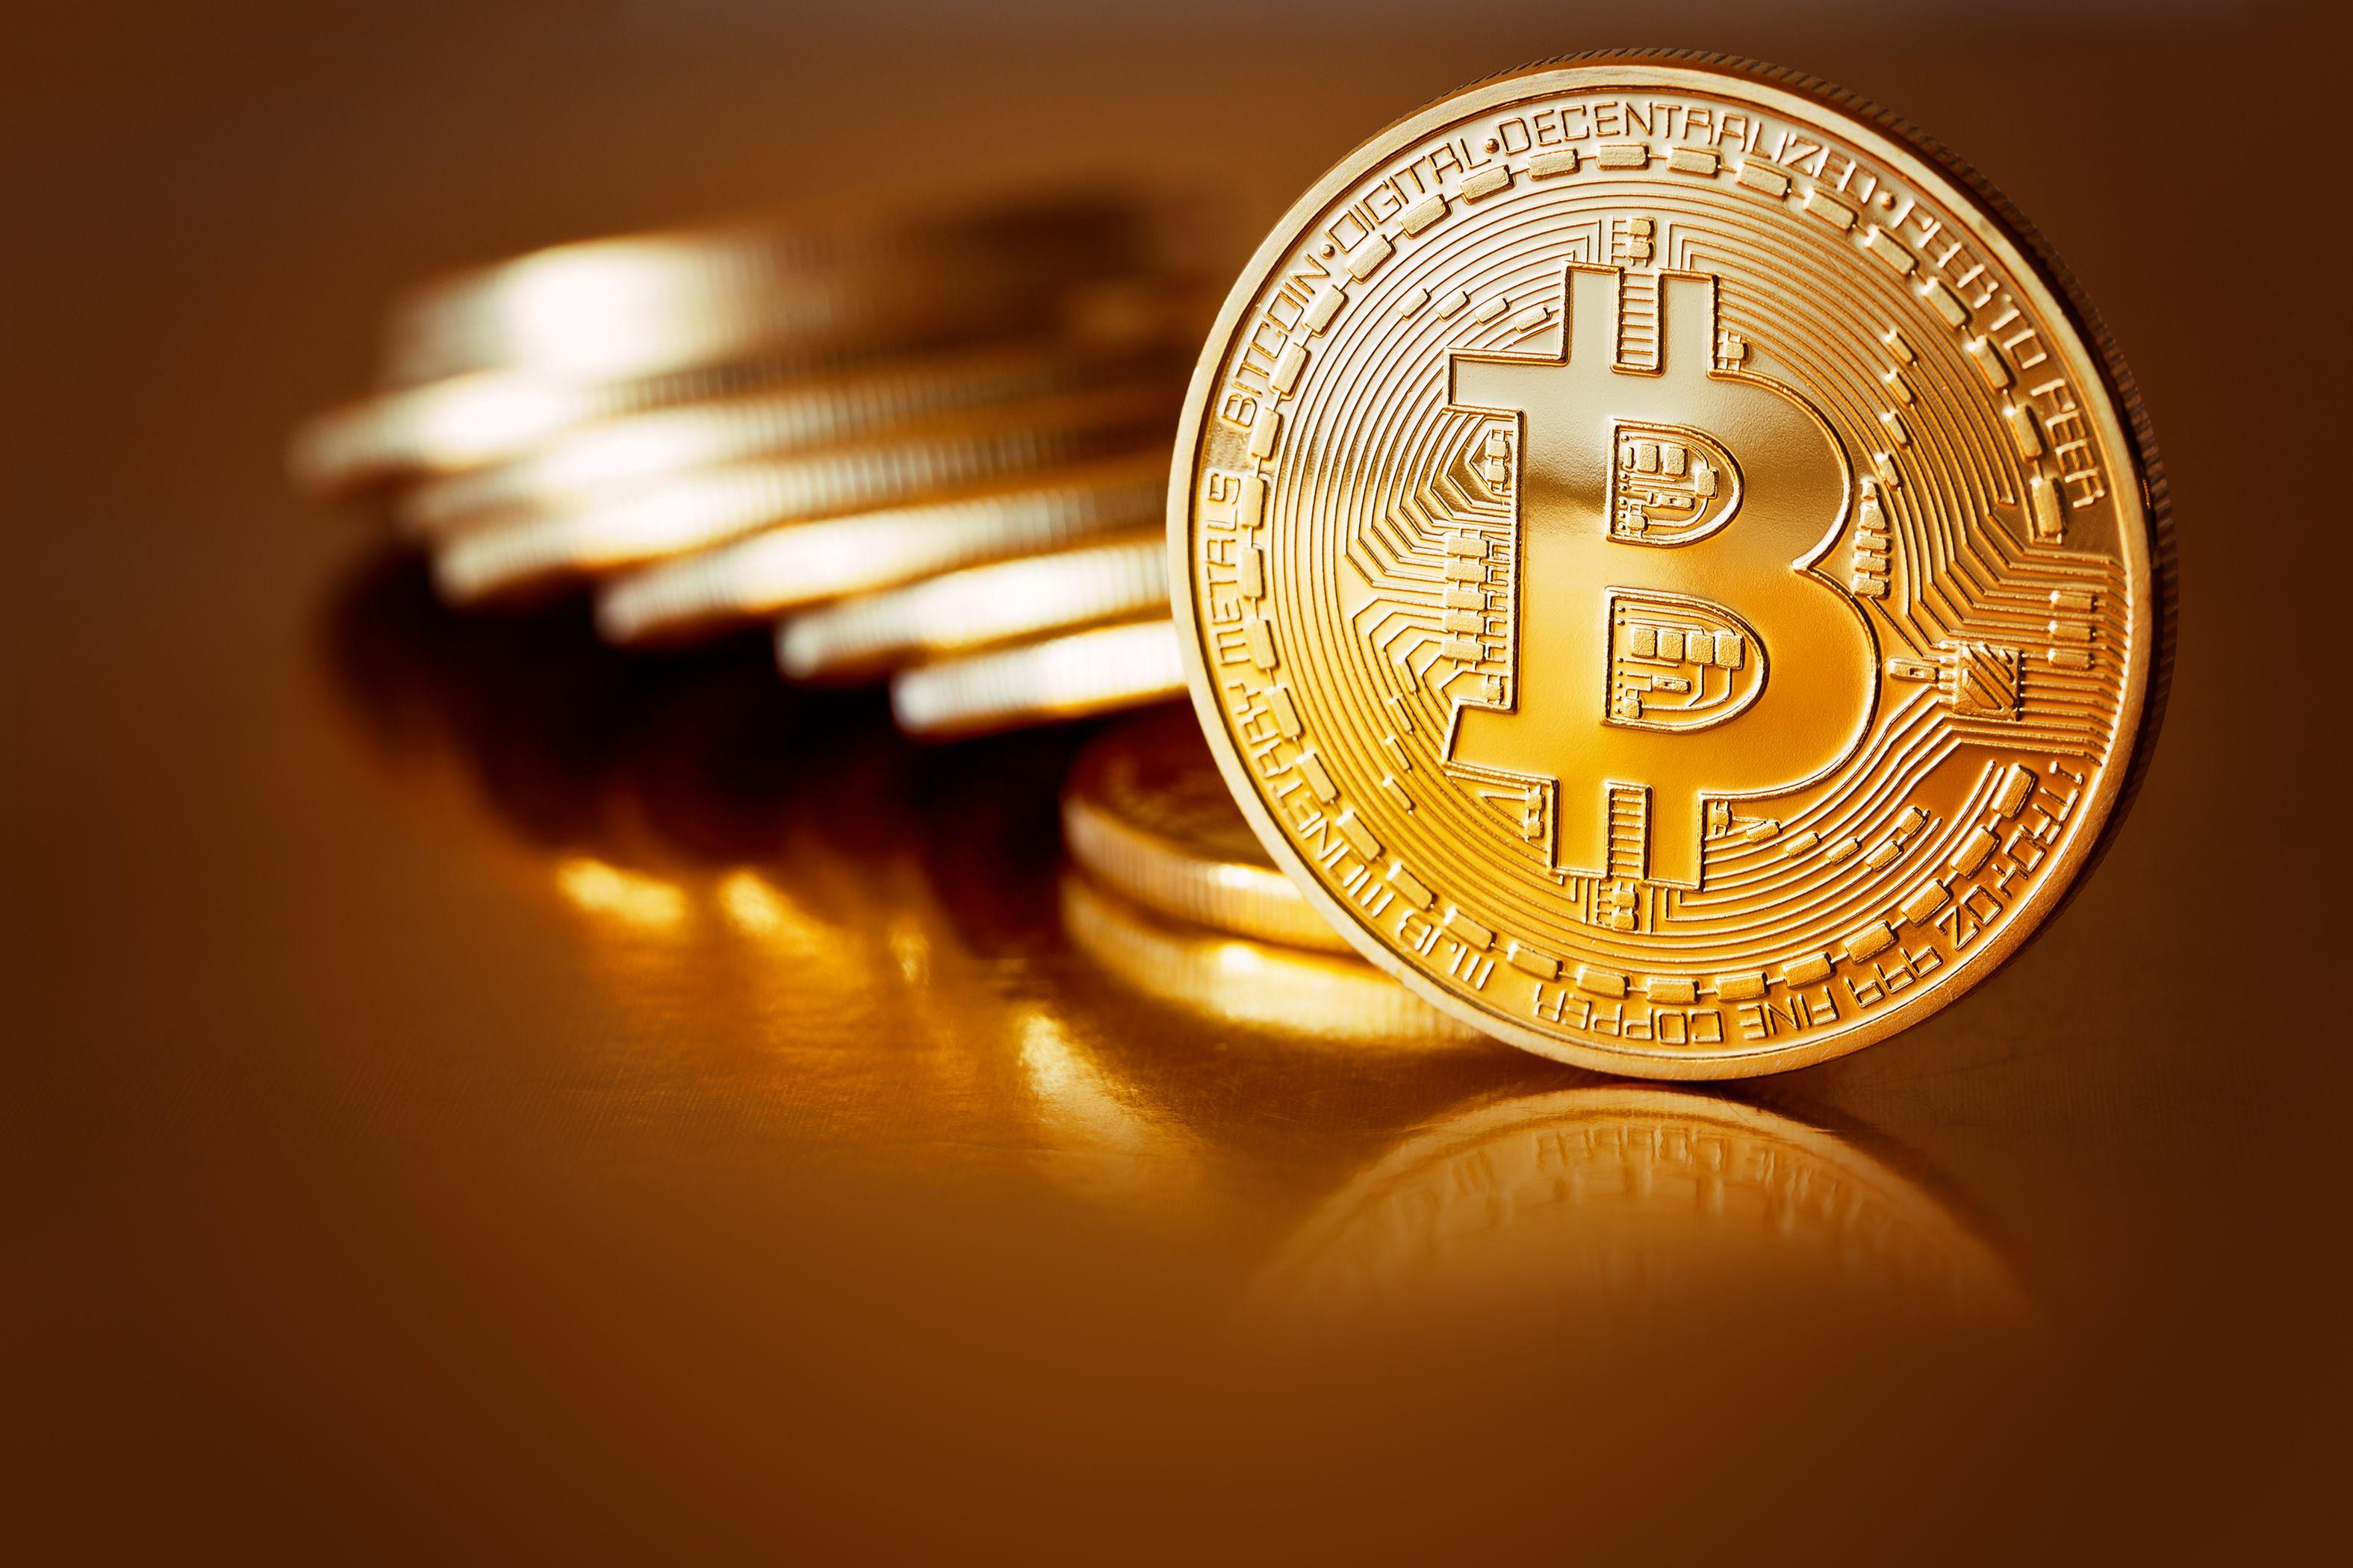 Hack de bitcoins buy spread betting tax sole income is social security